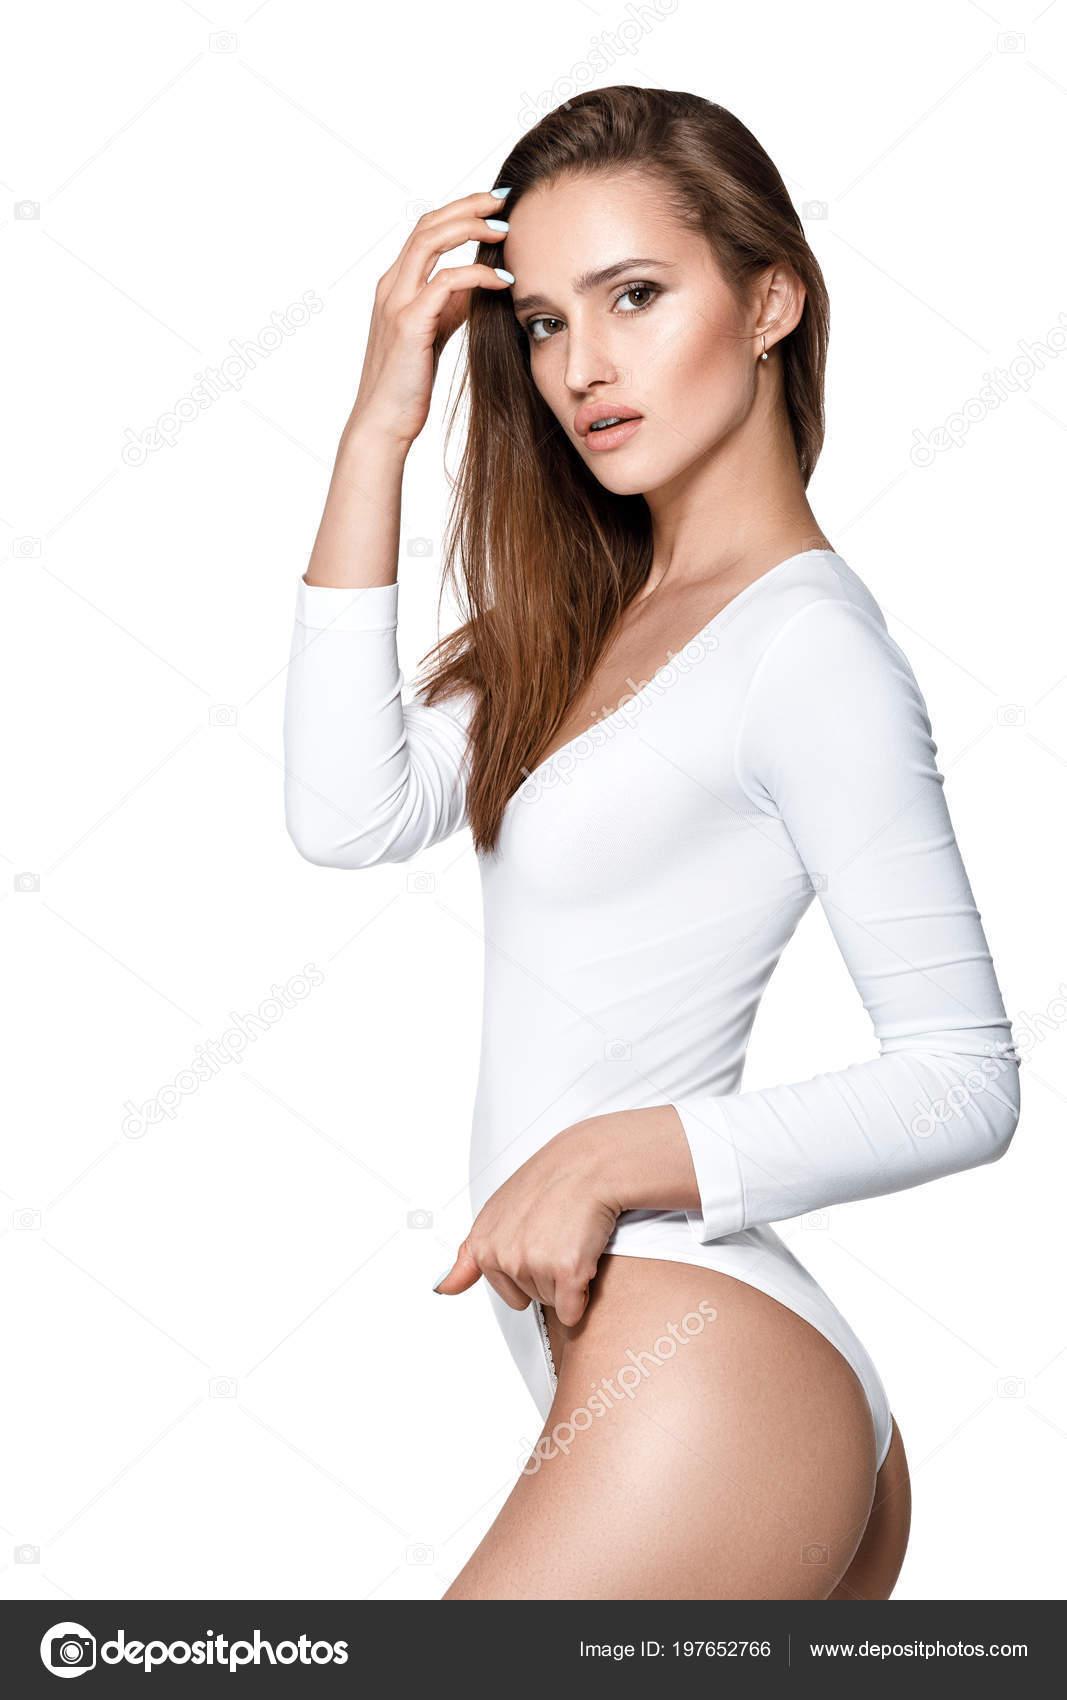 a418b8e2681 όμορφη σέξι γυναίκα με τέλειο σώμα σε λευκό κορμάκι — Φωτογραφία ...